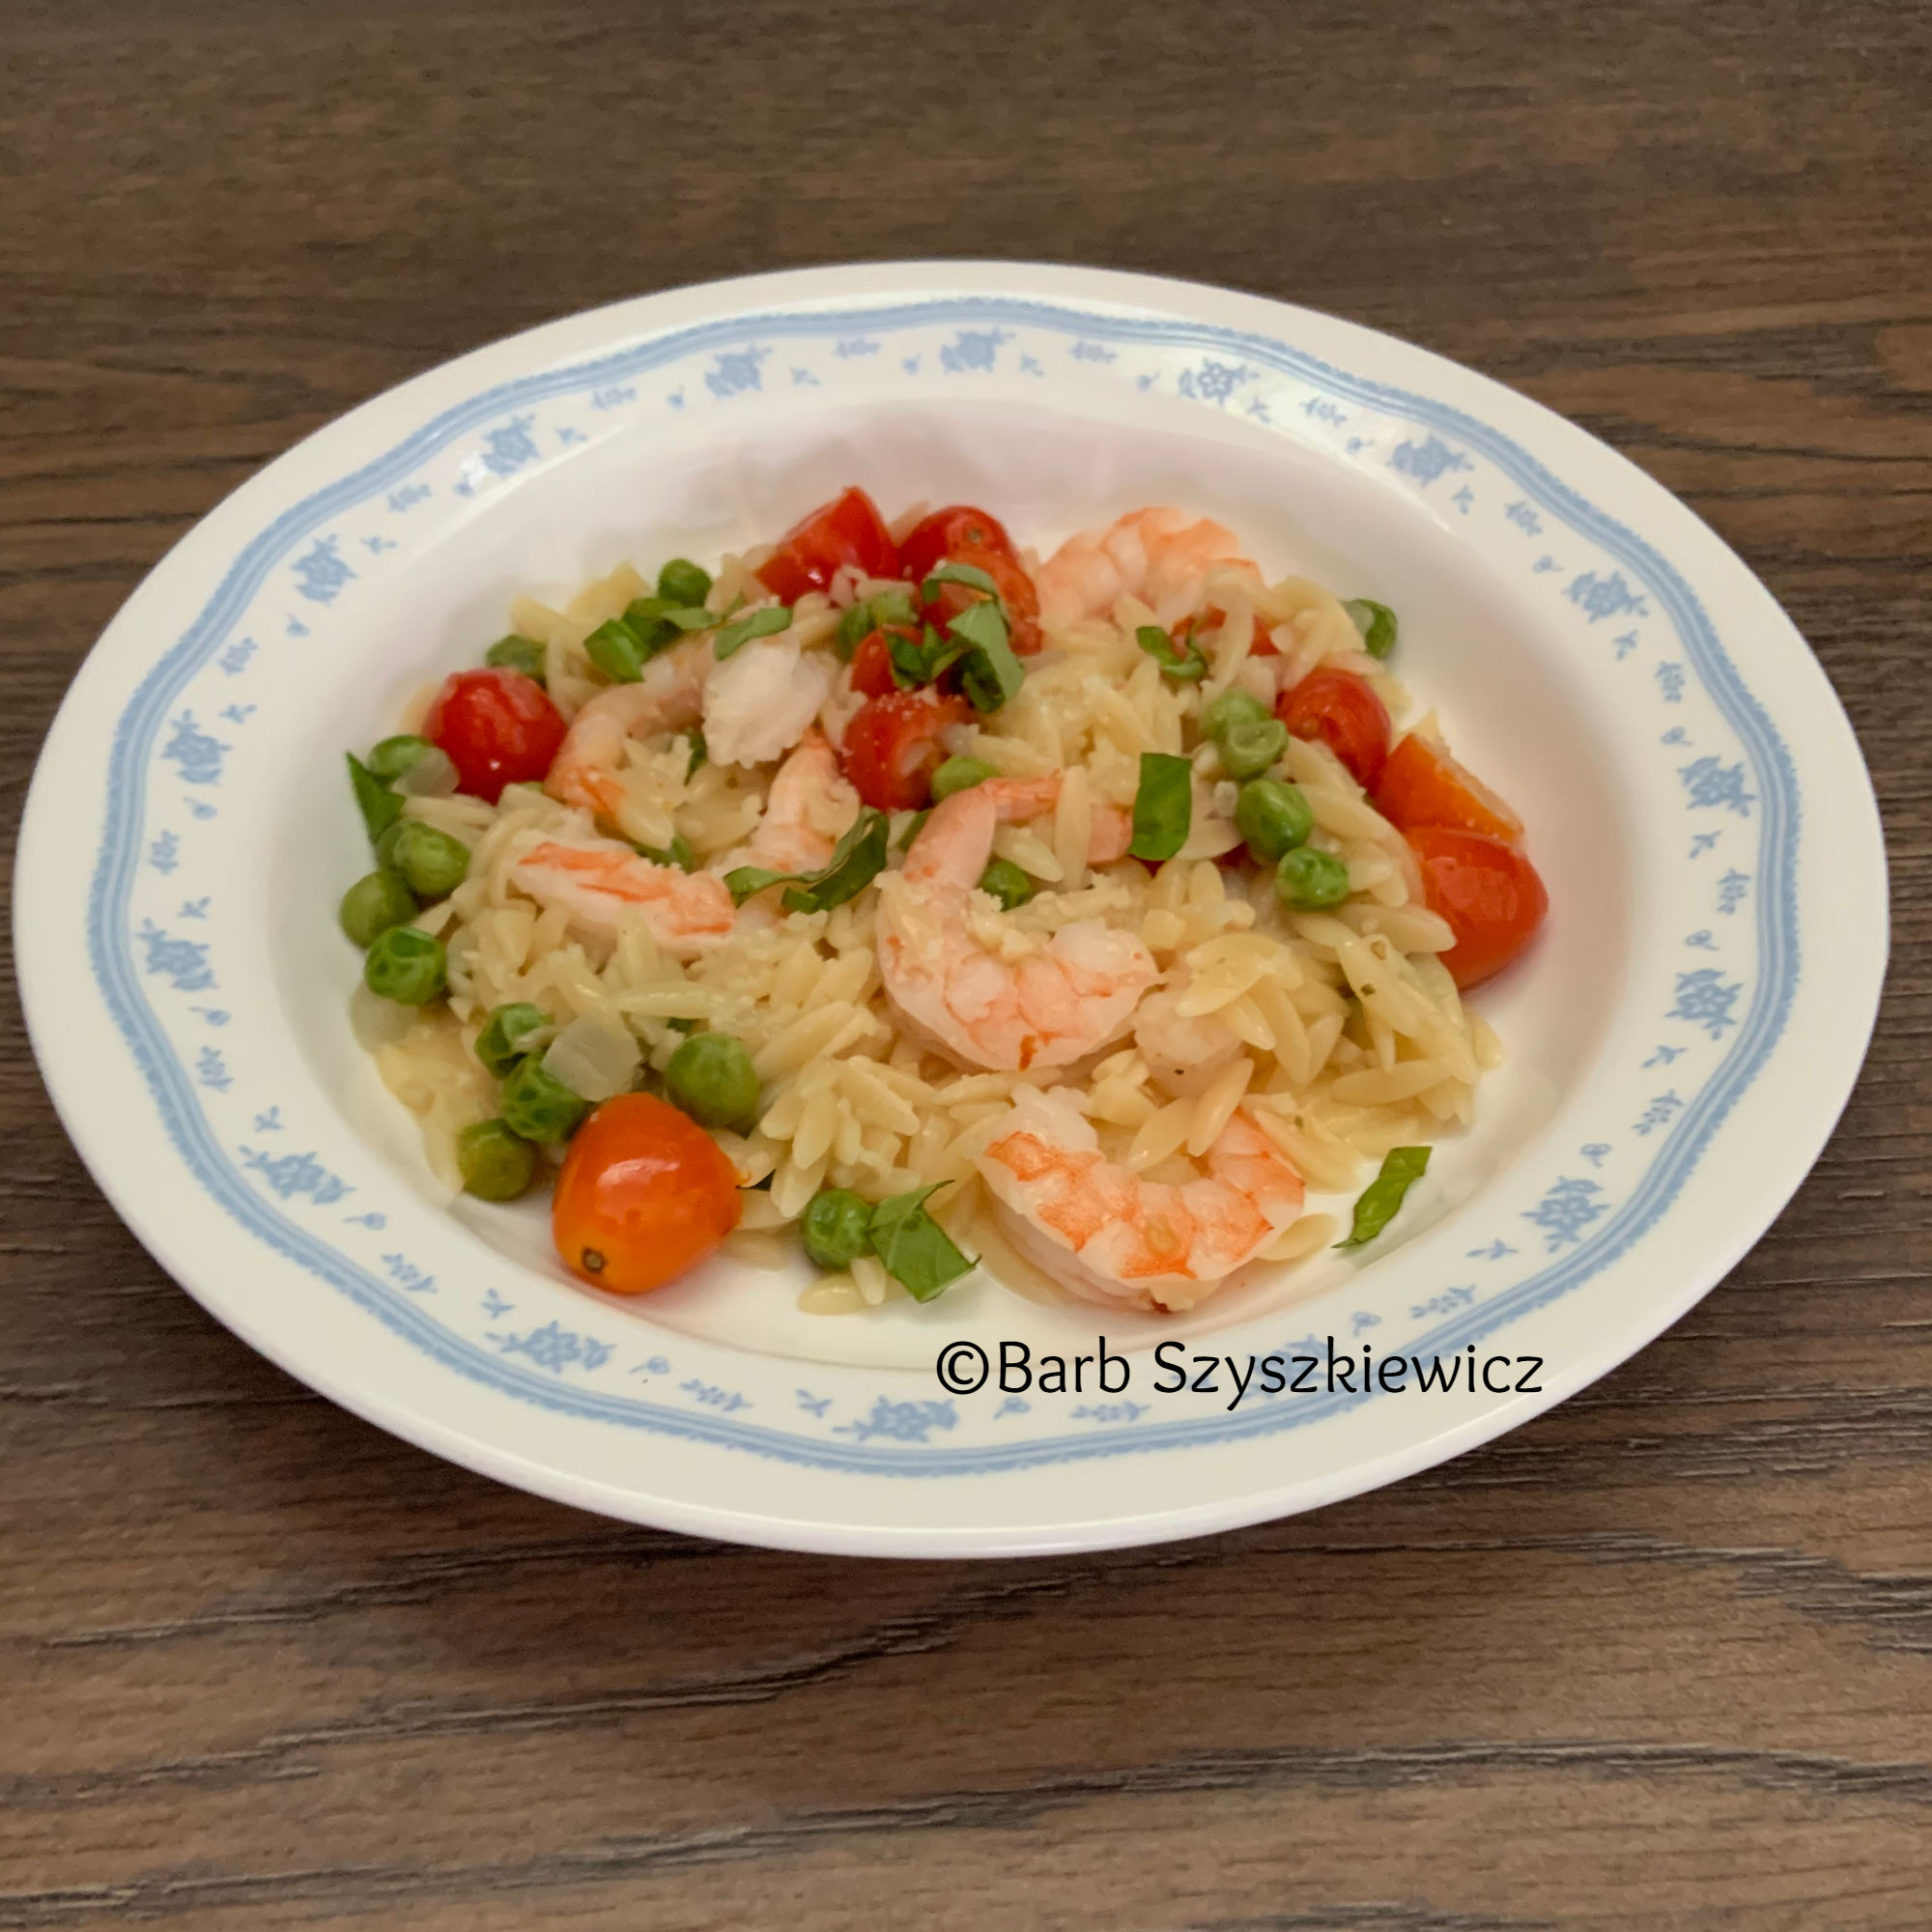 orzo with shrimp and vegetables-bszyszkiewicz-0115